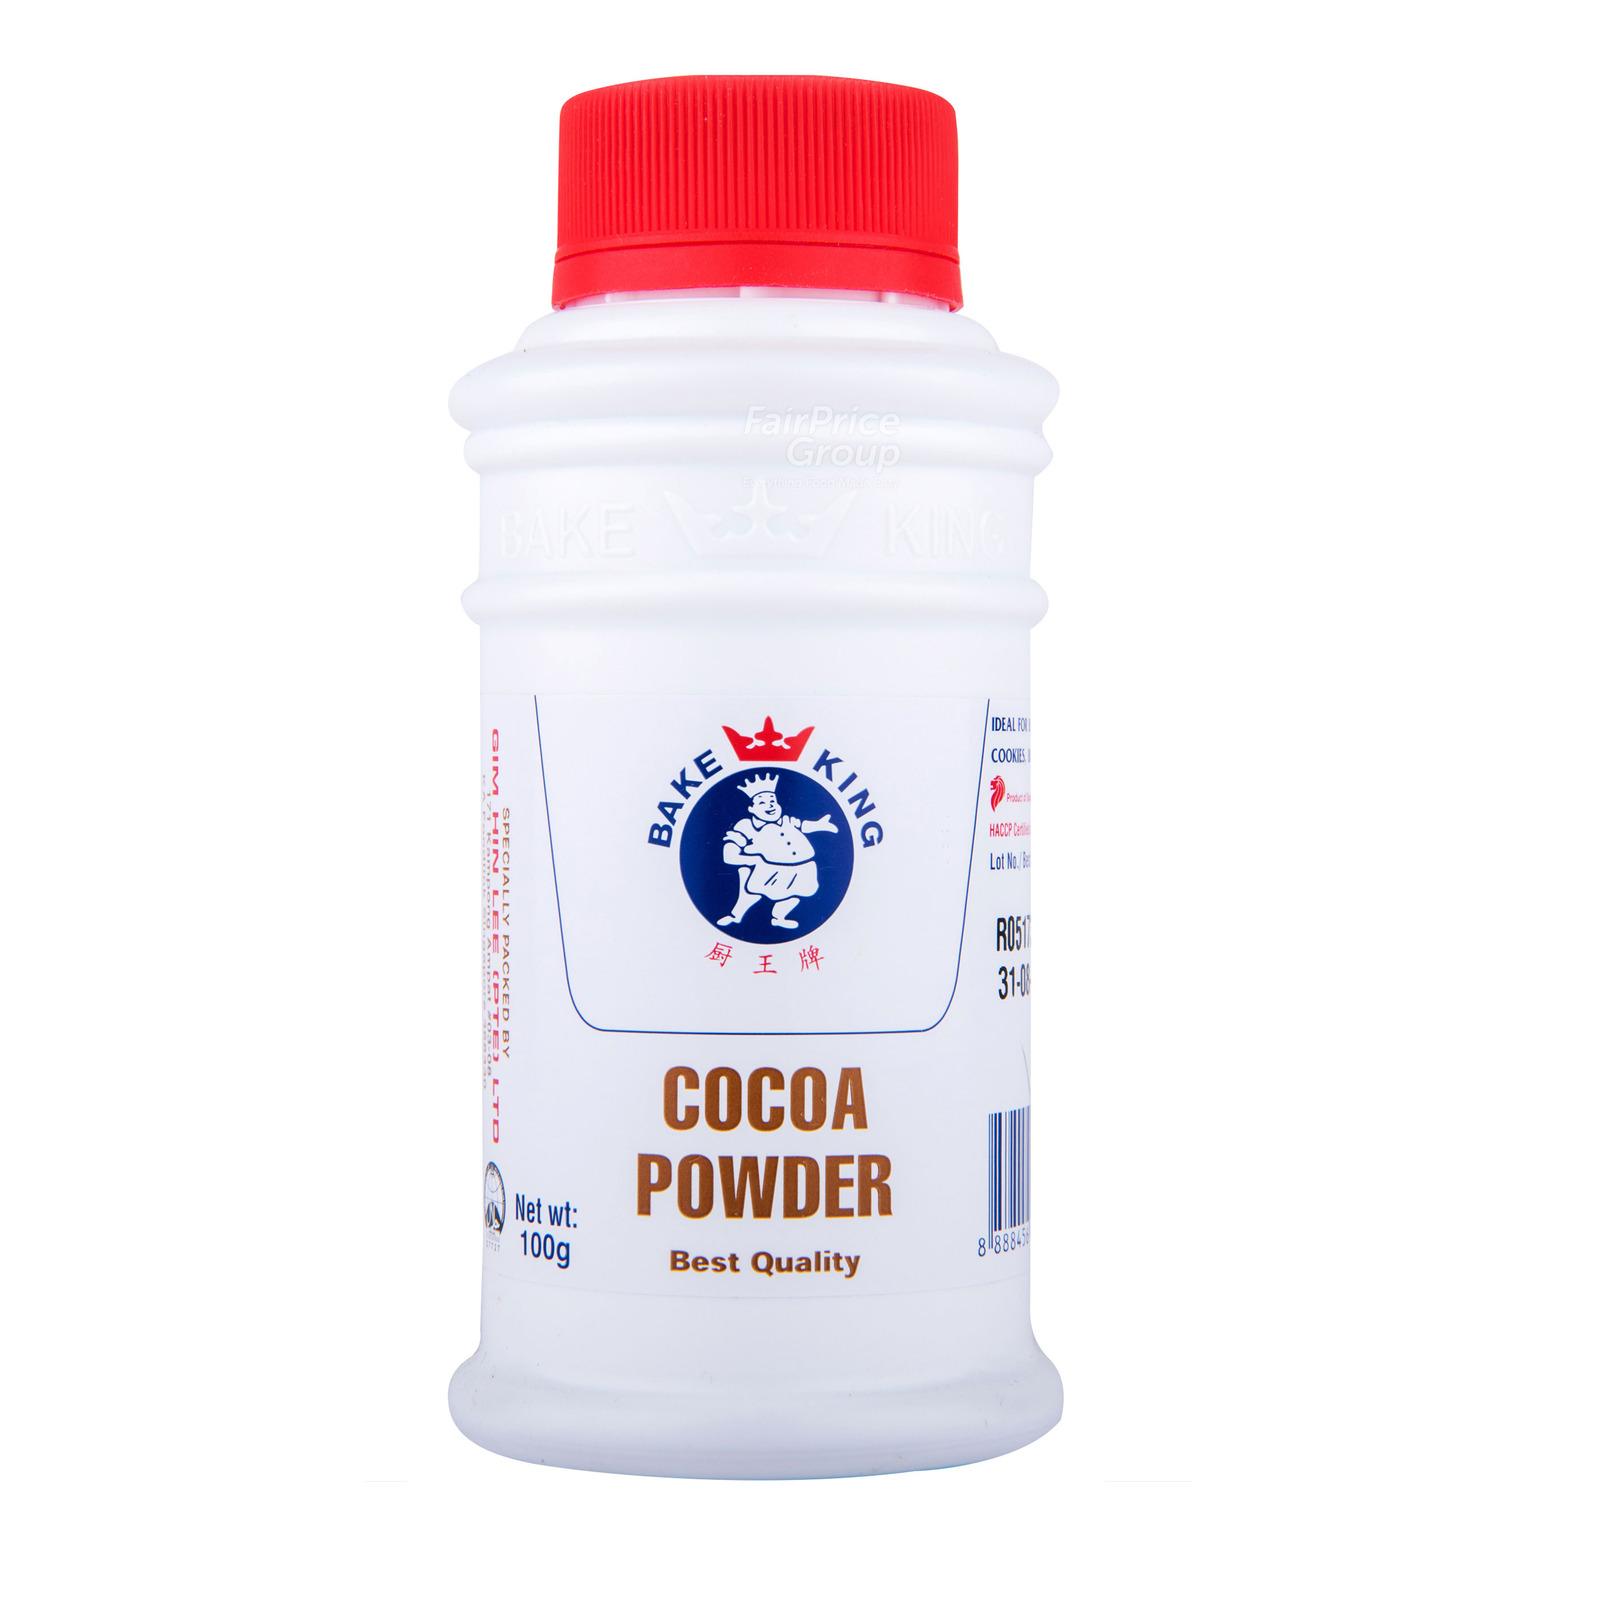 Bake King Powder - Cocoa